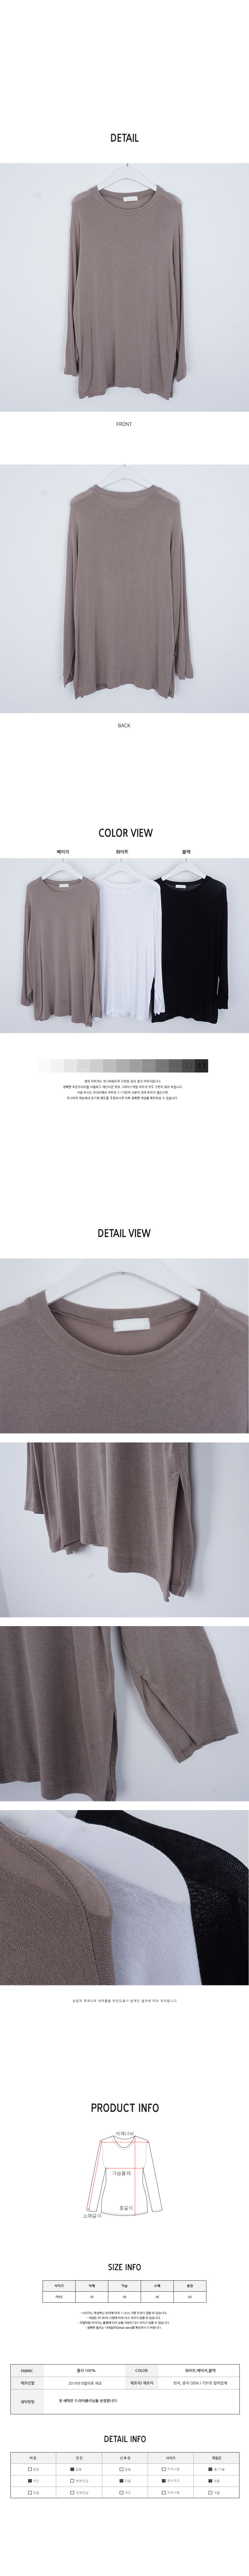 Evoim T-shirt